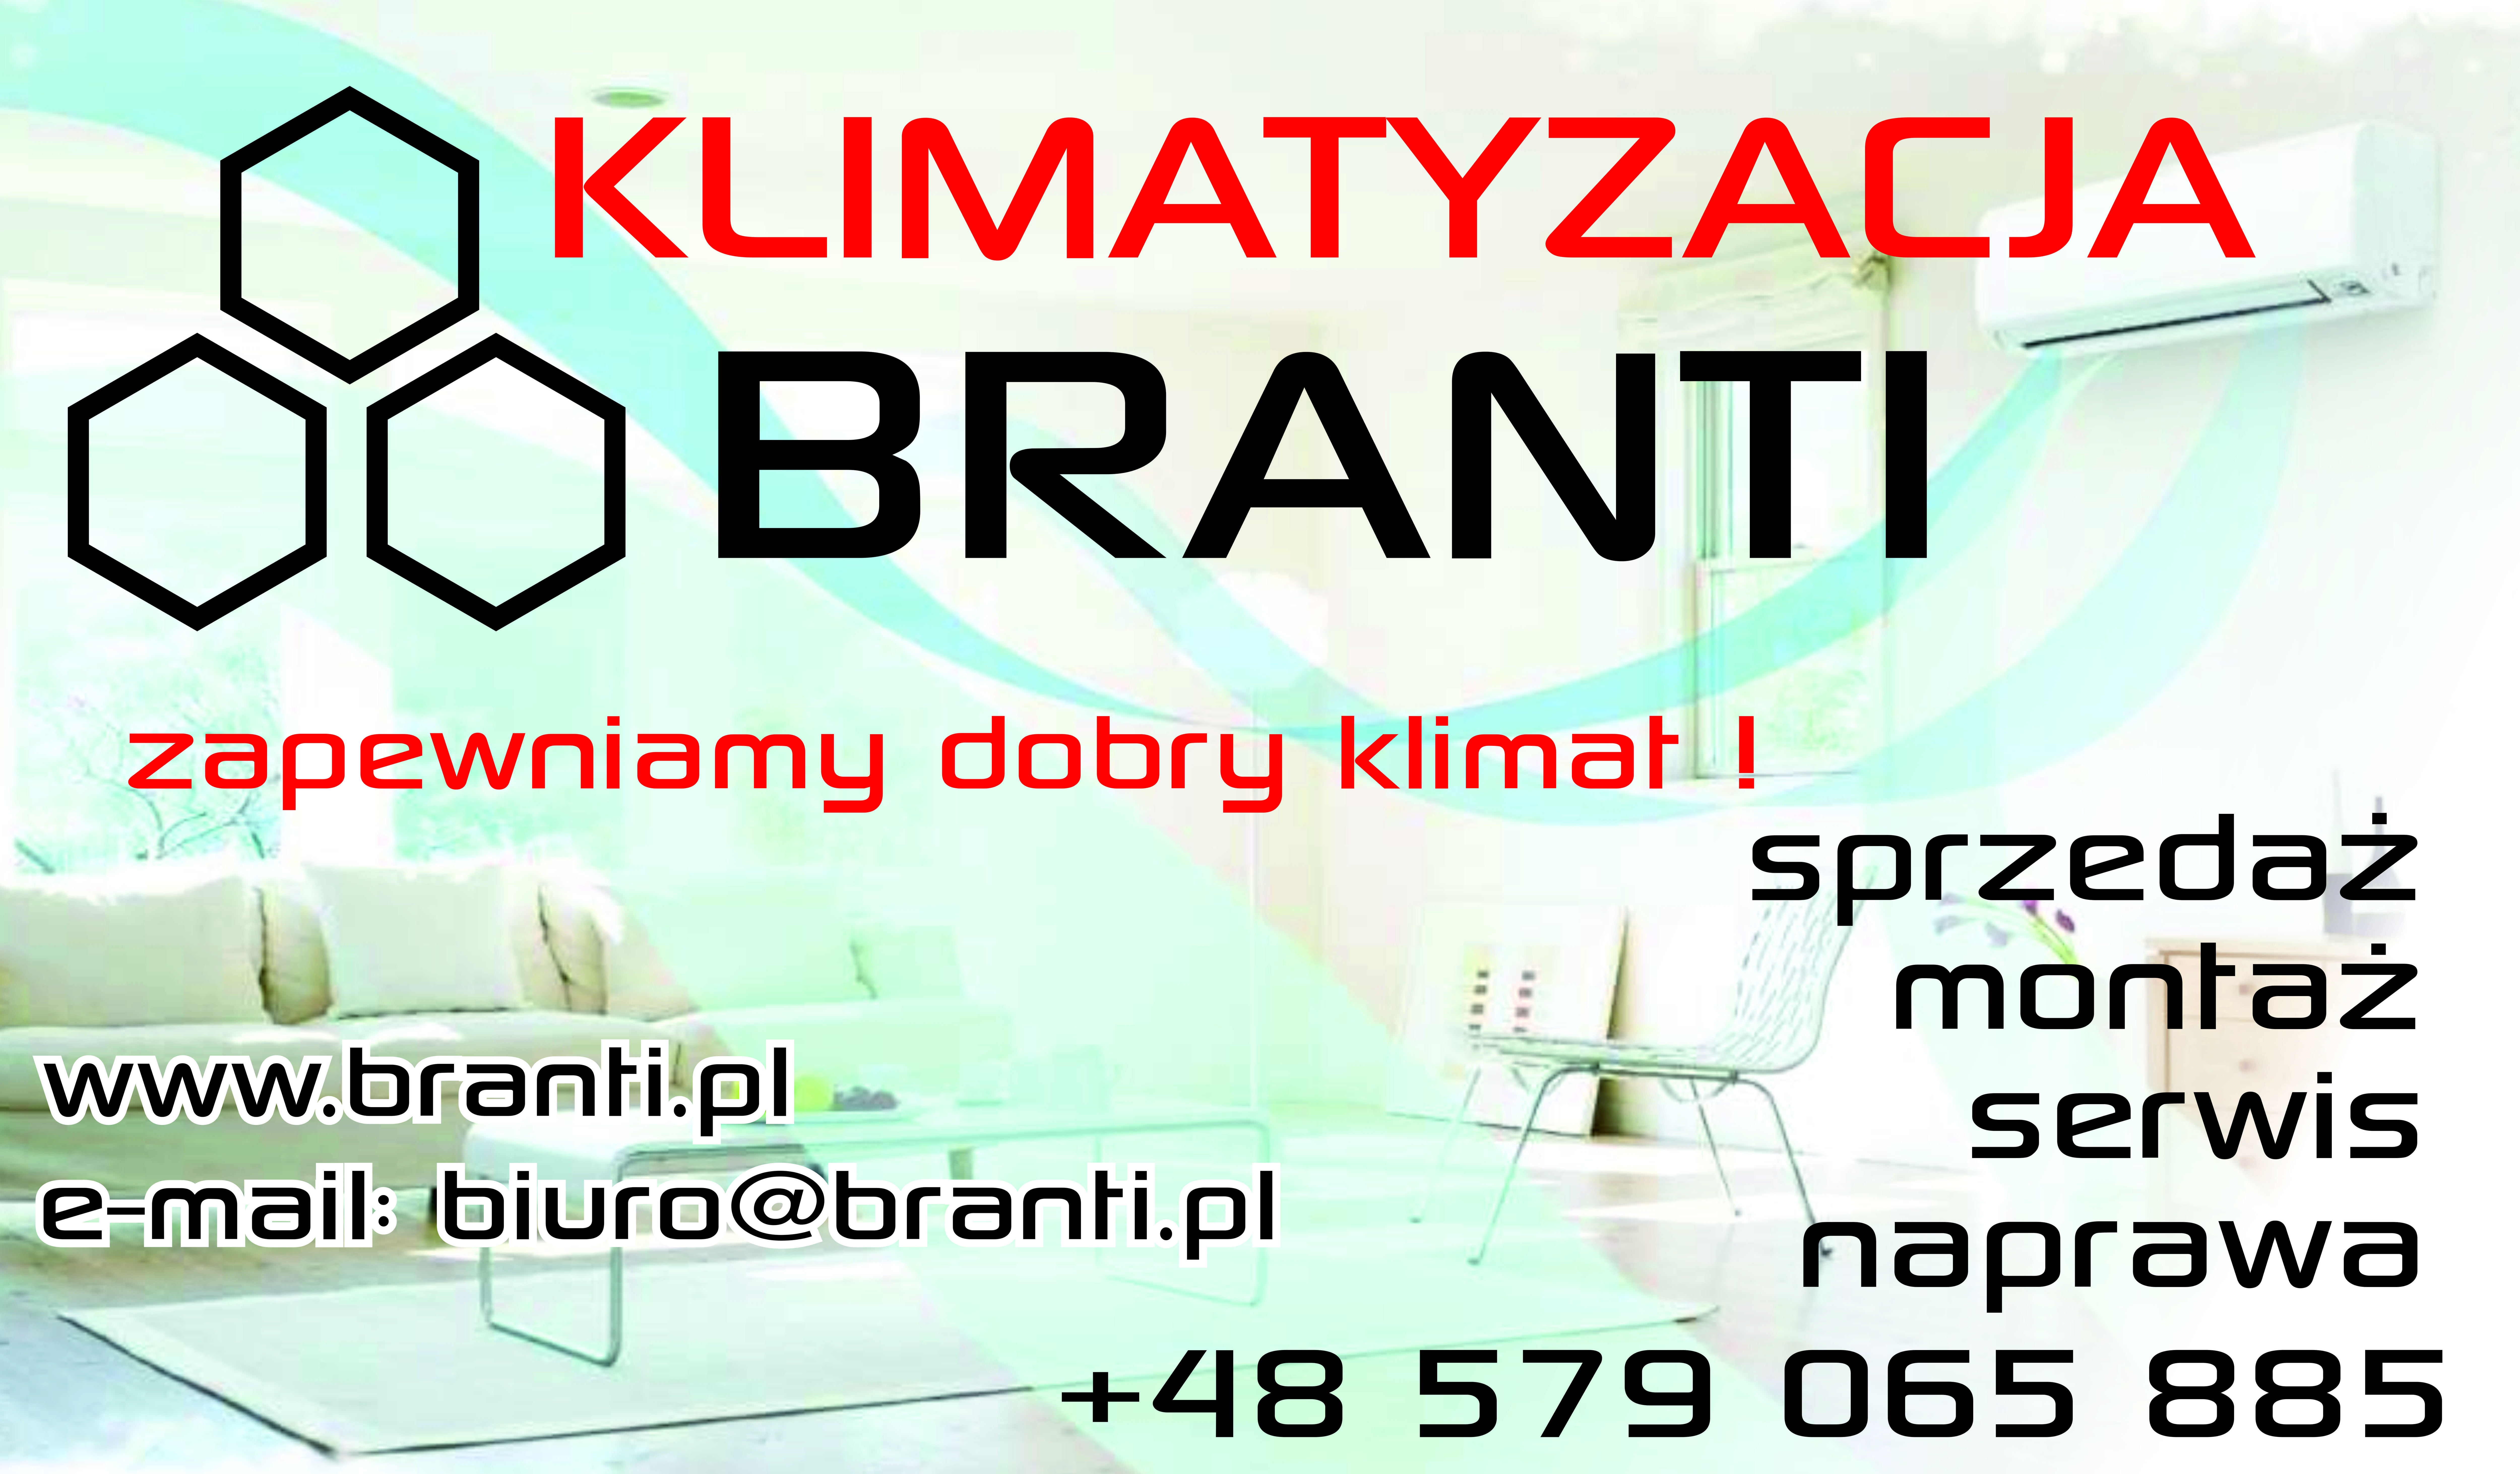 Branti